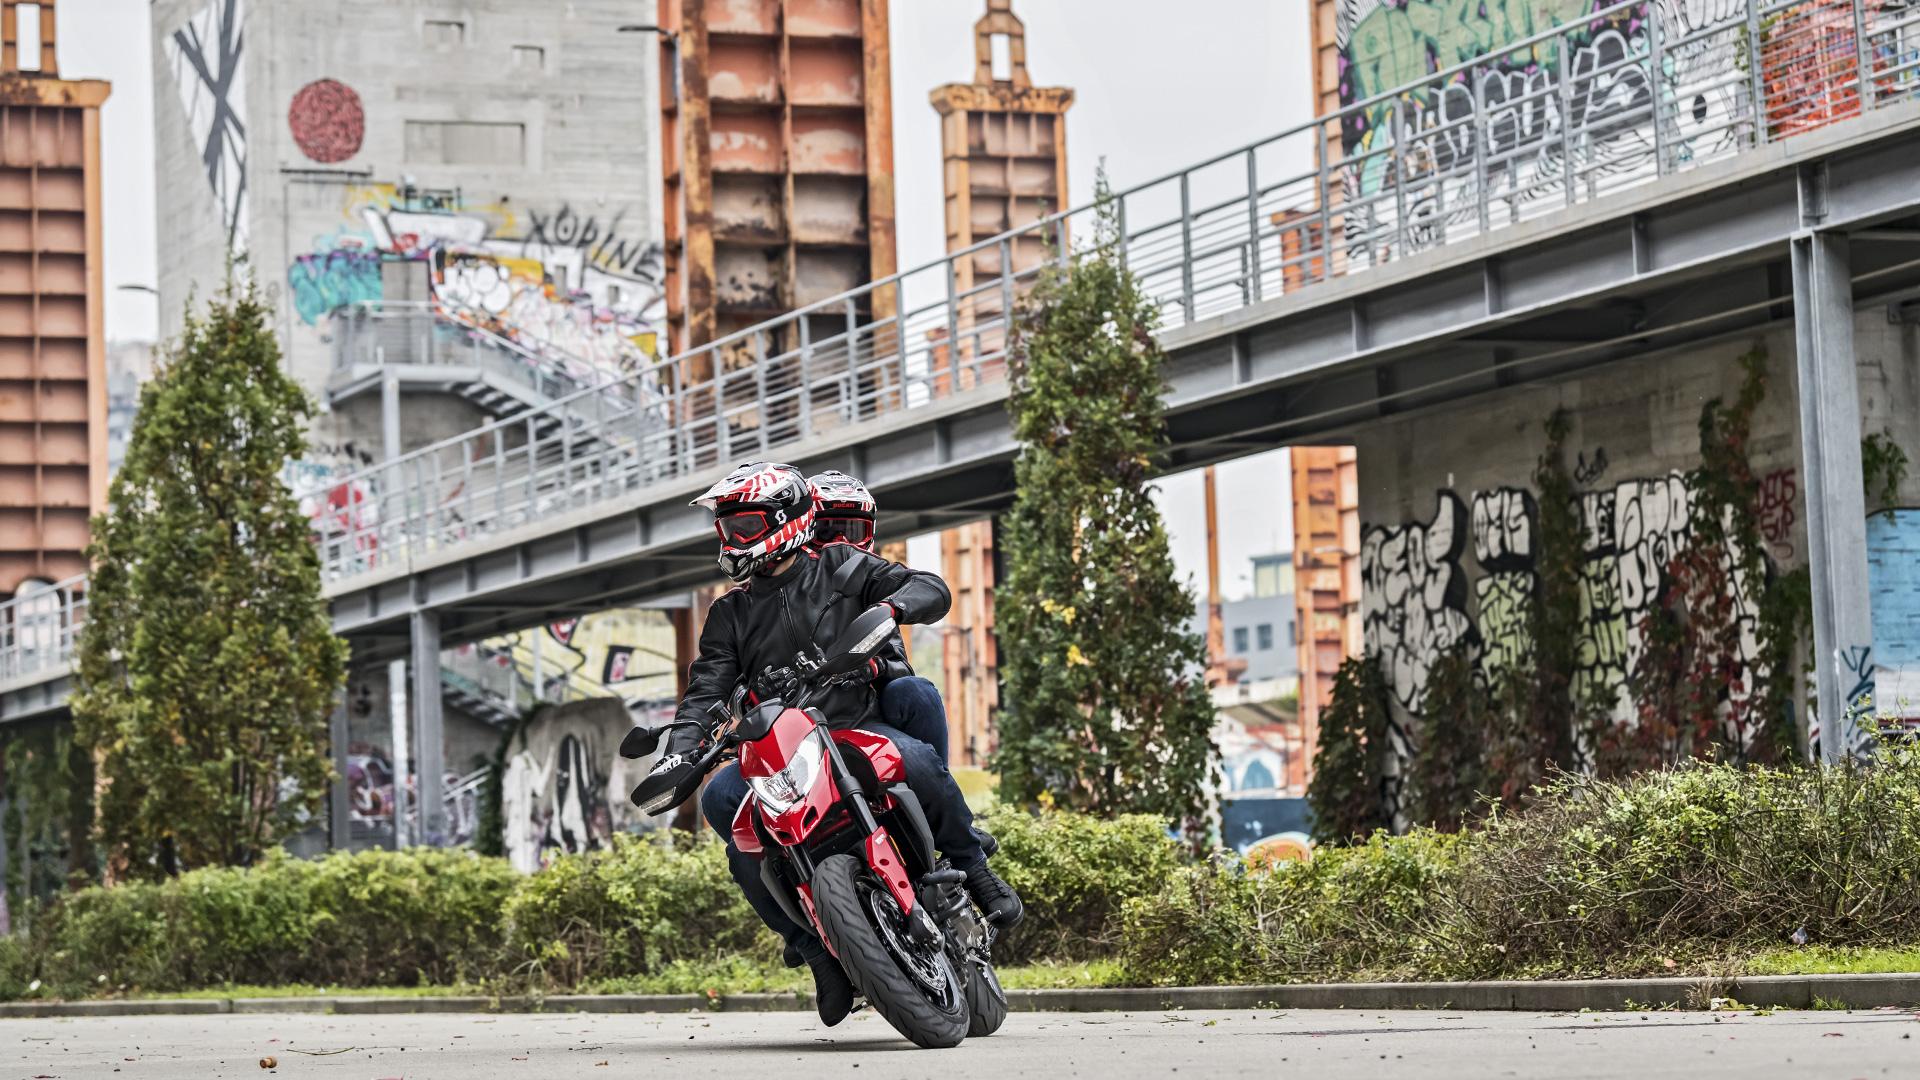 New Ducati Hypermotard 950 | Pure Fun, Endless Adrenalin